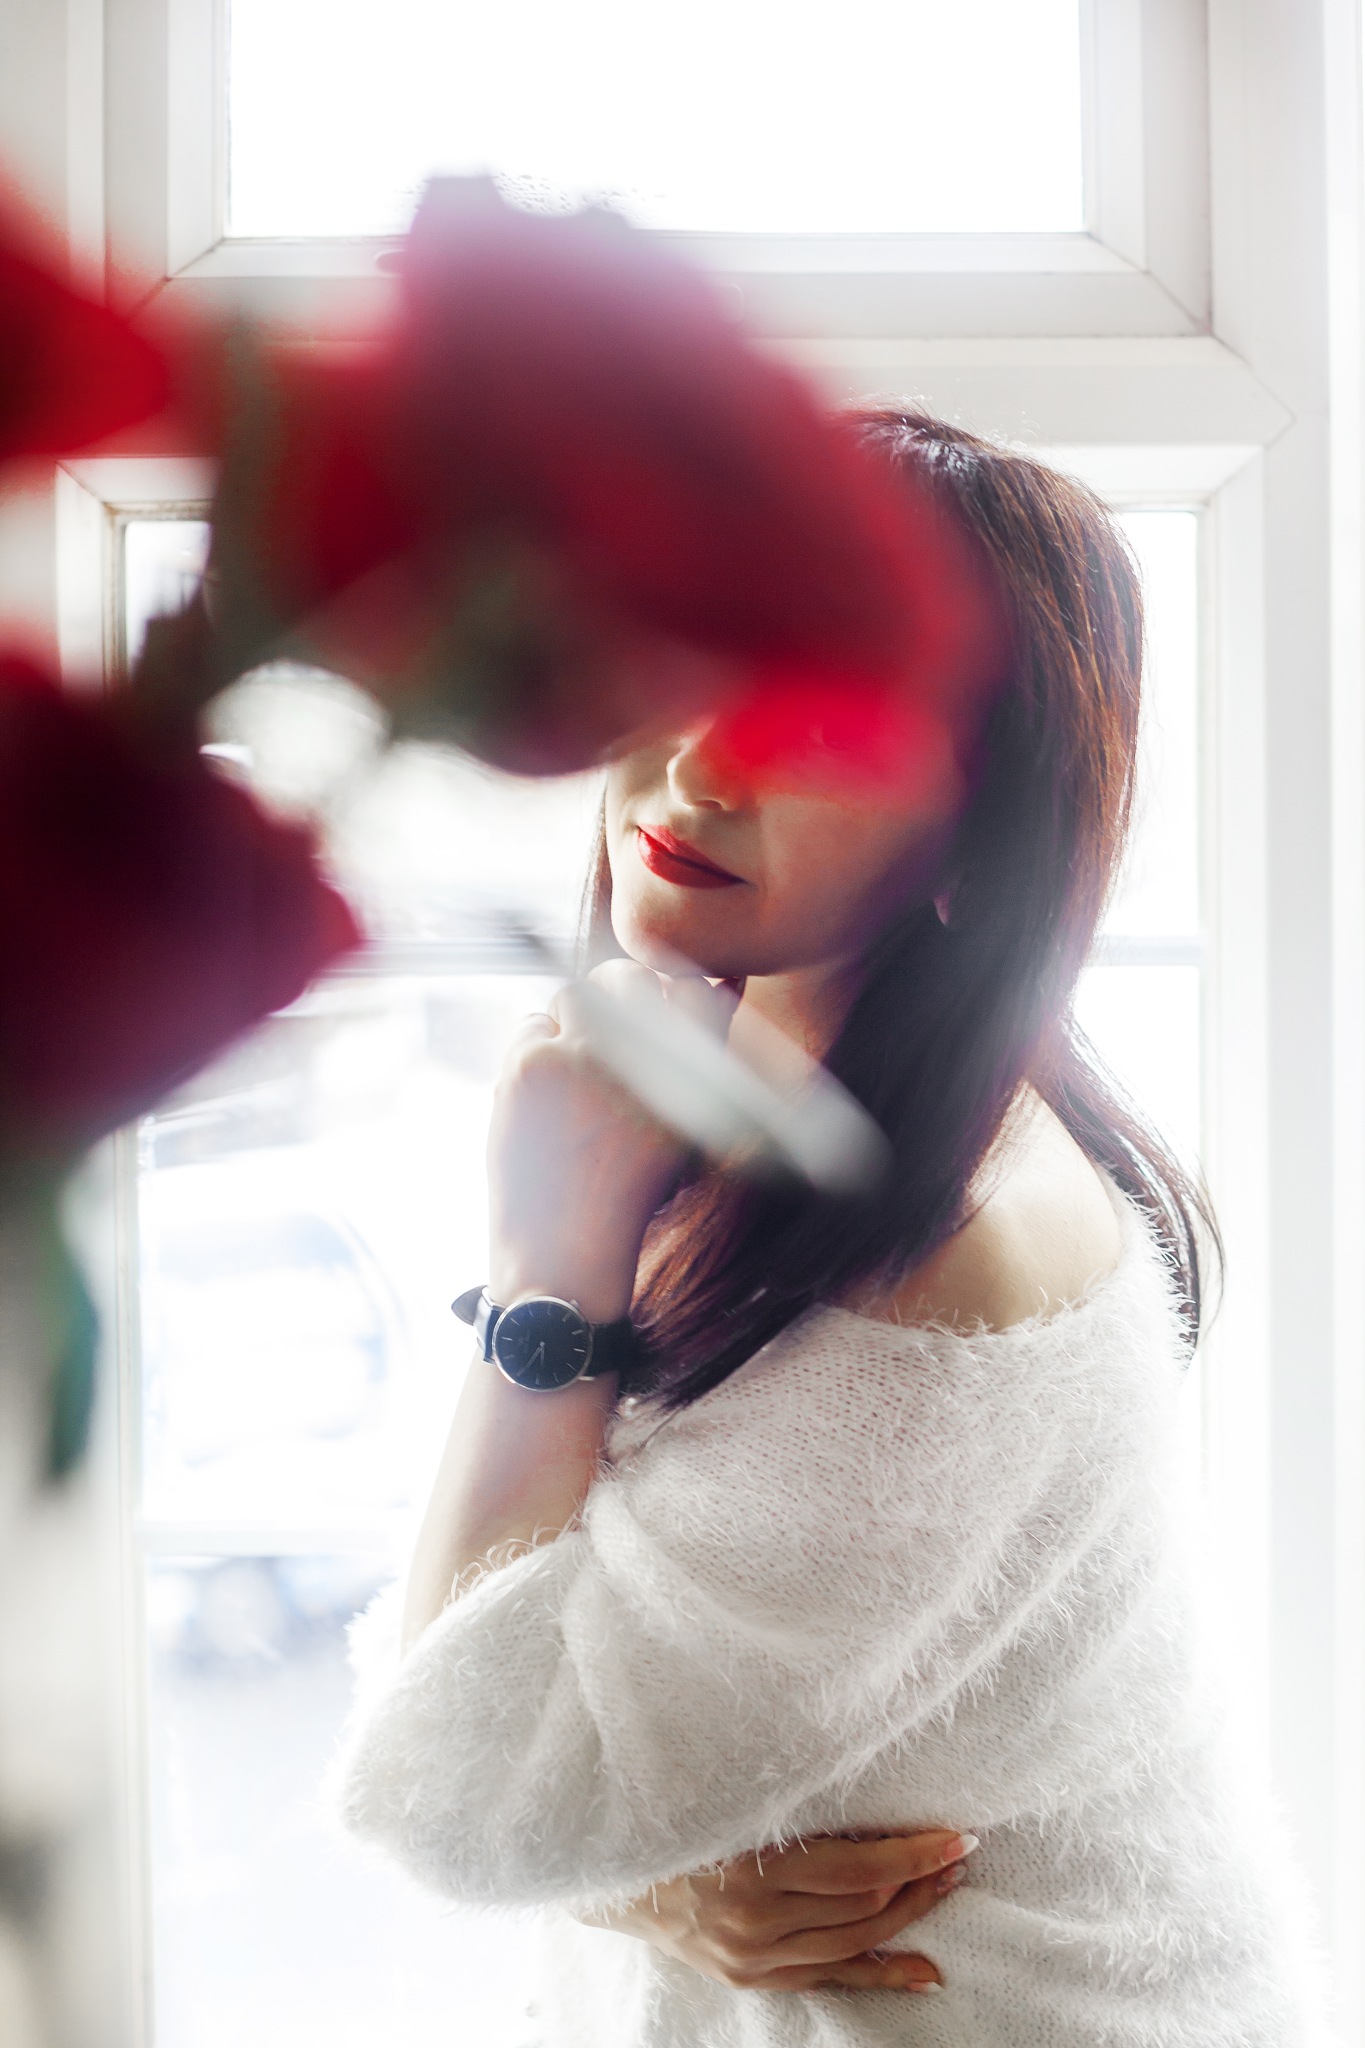 The rose by Ralica Danailova